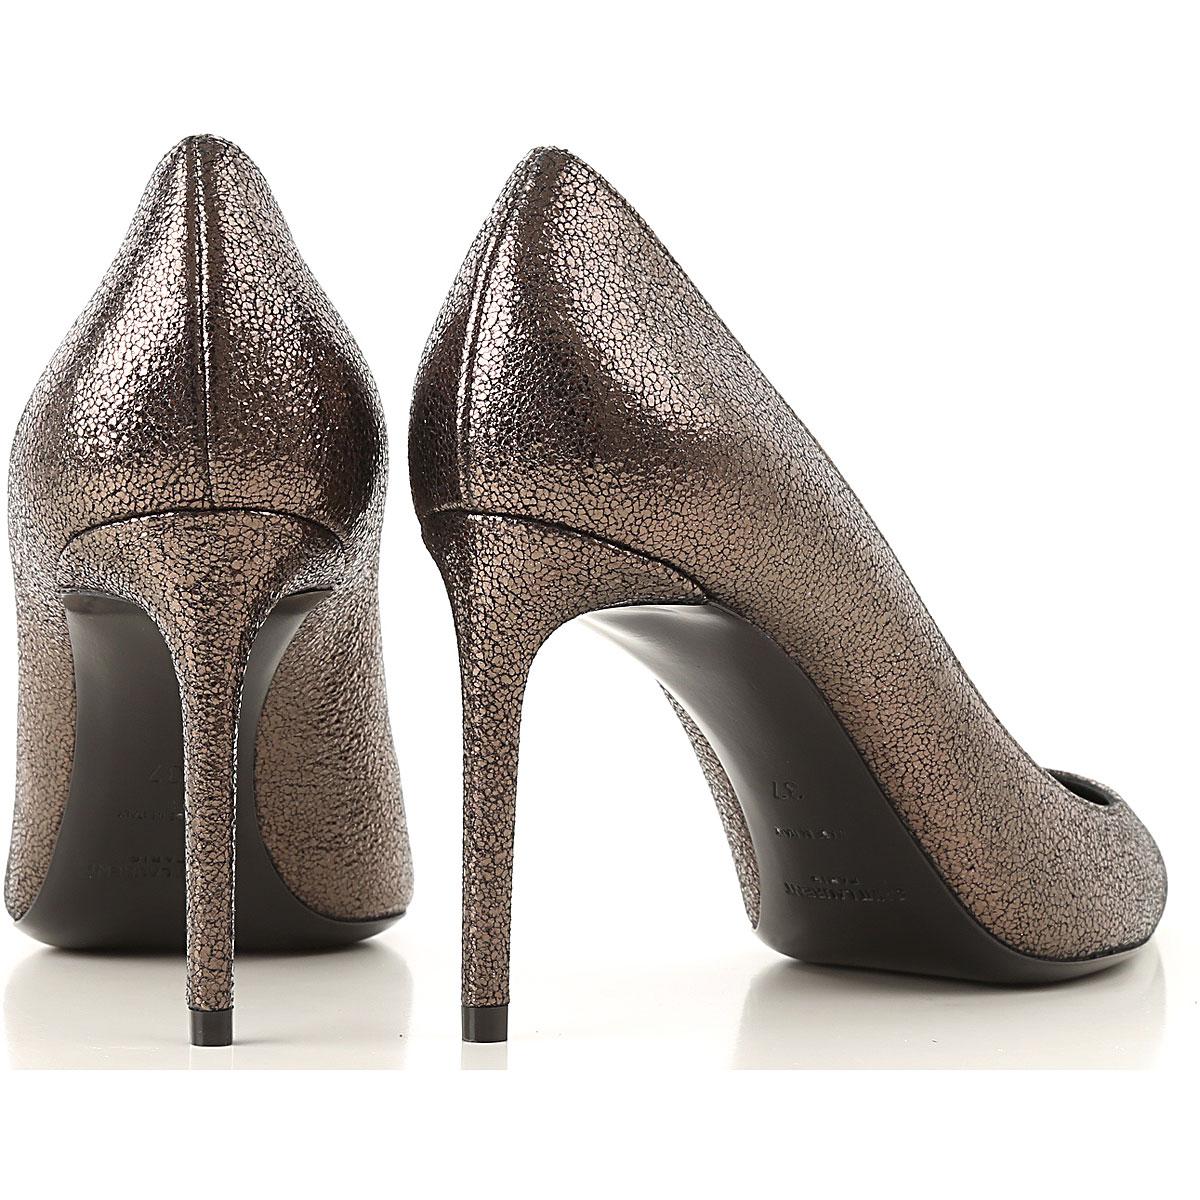 2019 nbsp; Primavera Metálico Para Laurent Bronce verano Zapatos Saint Mujer a7WgZq6qCw